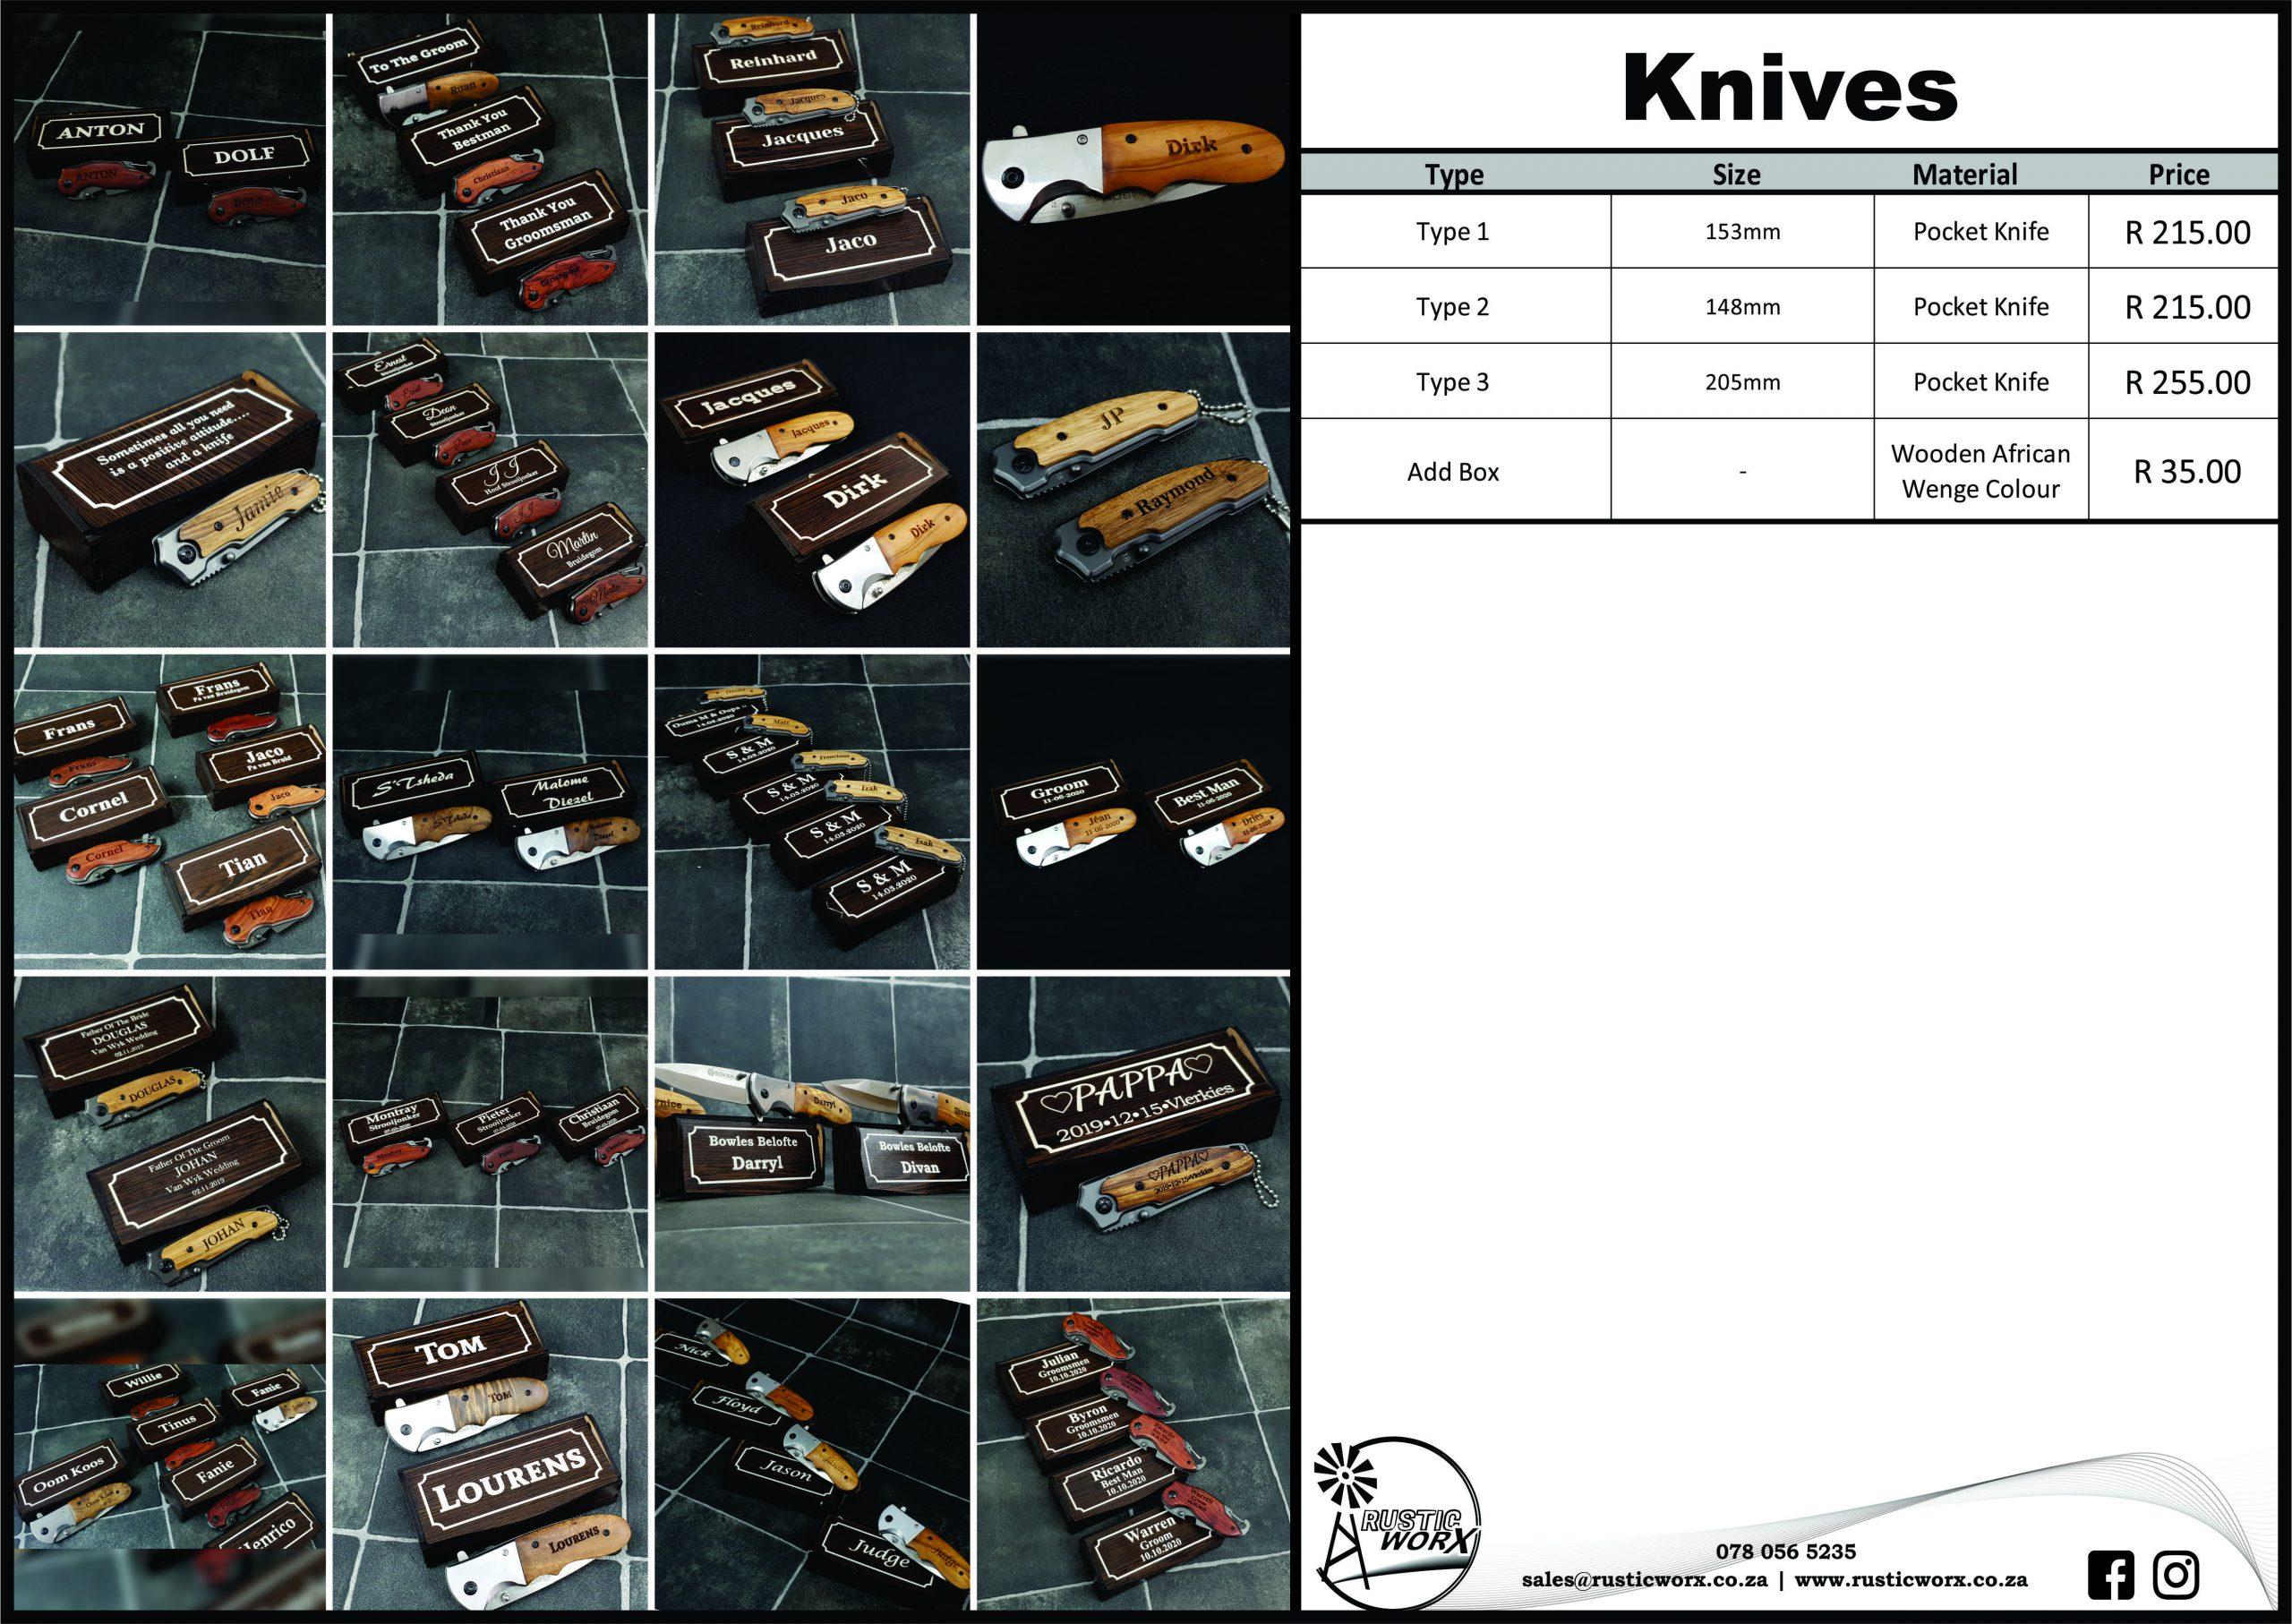 15 Knives